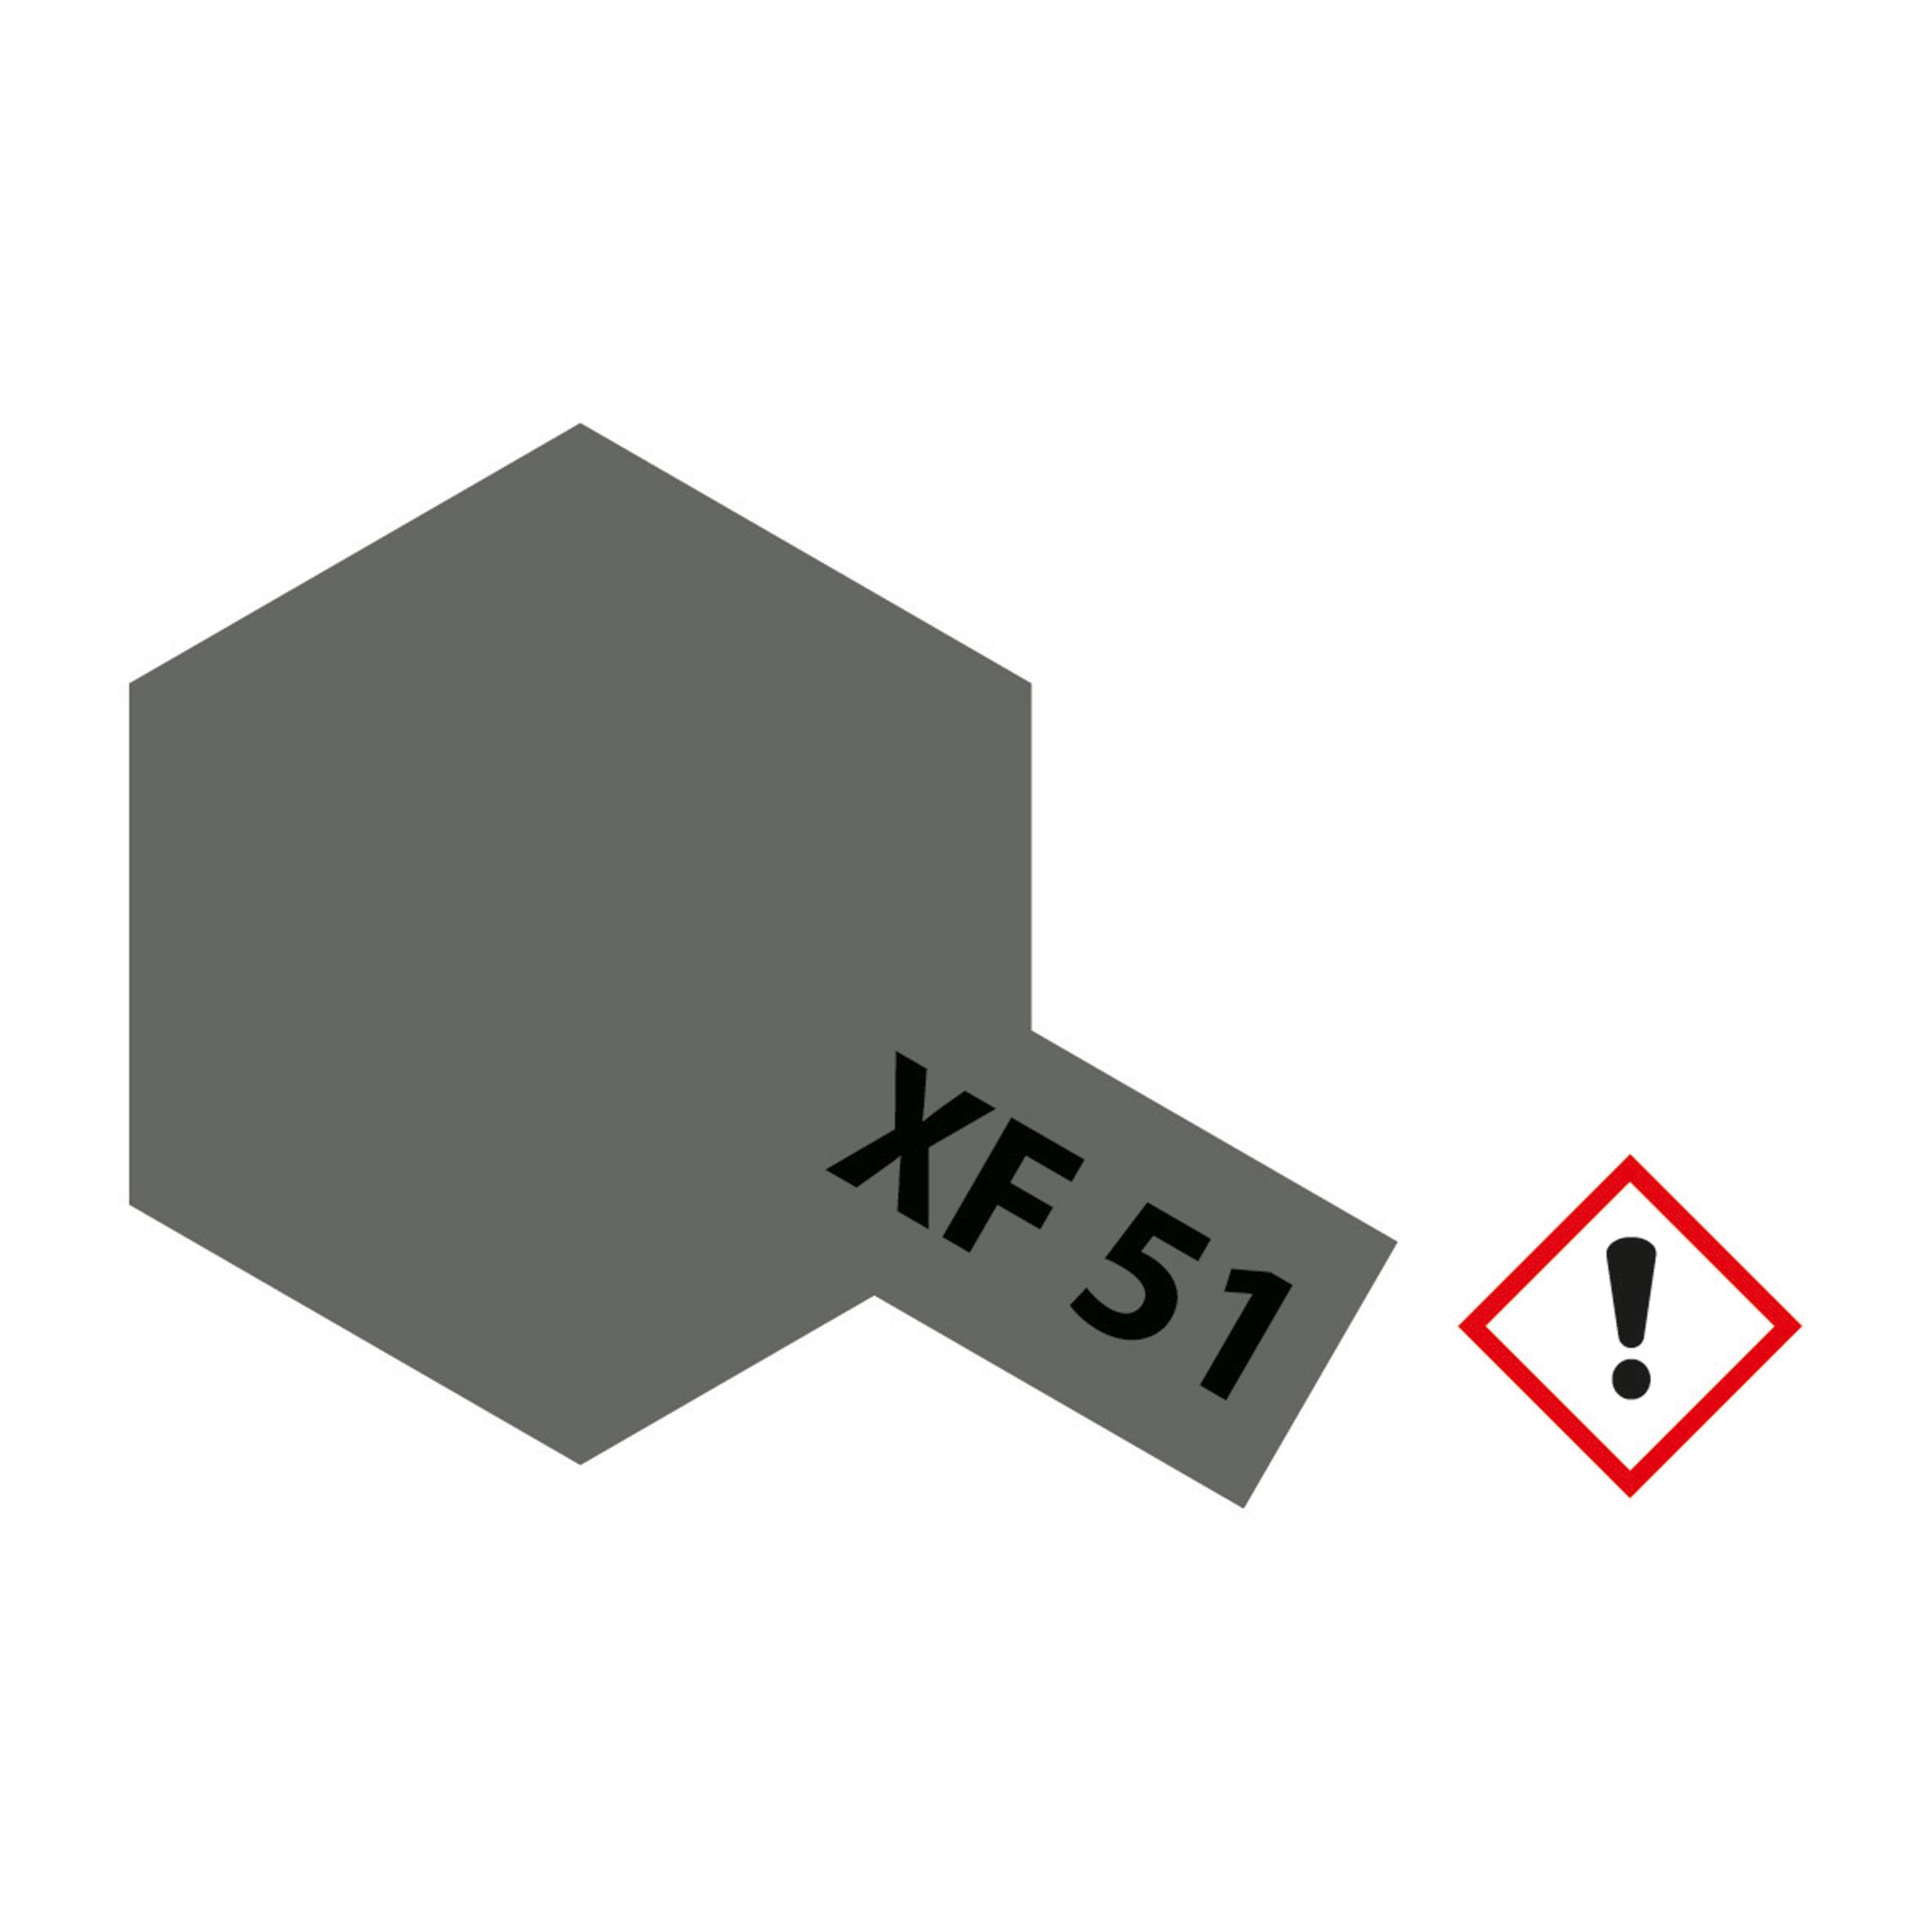 XF-51 Khaki Drab matt - 23ml Acrylstreichfarbe wasserloeslich Tamiya 300081351